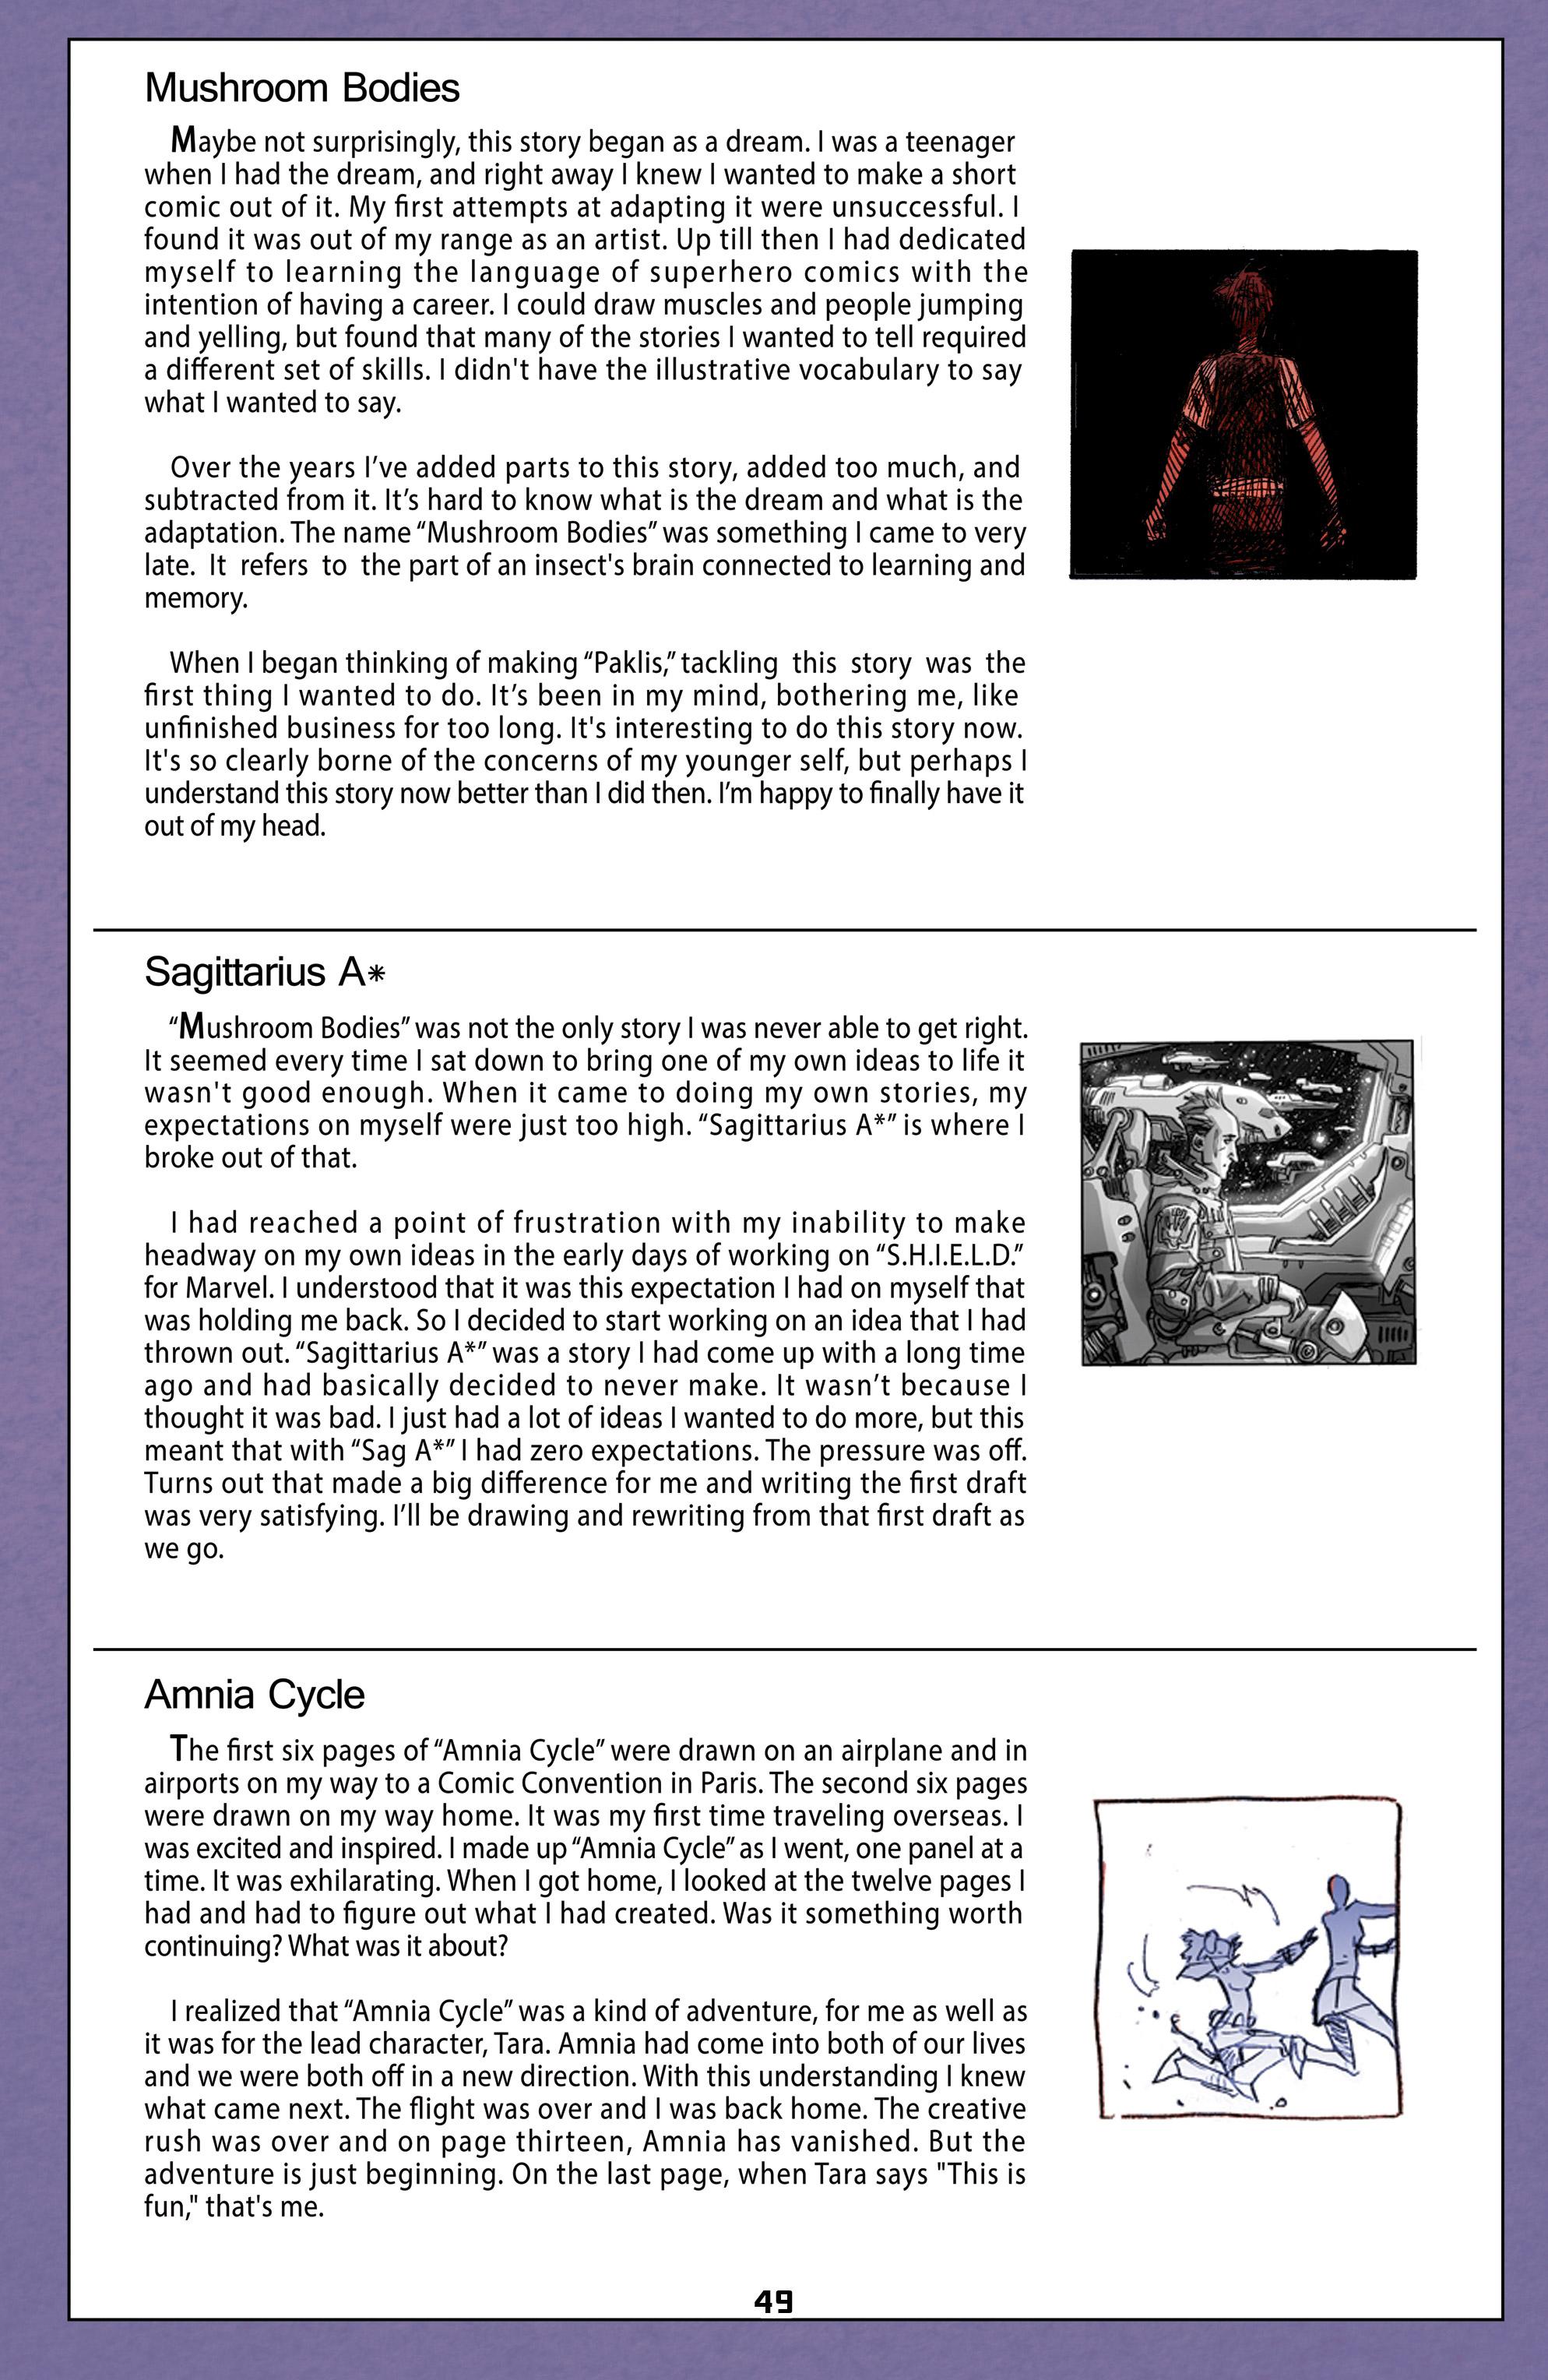 Read online Paklis comic -  Issue #1 - 50